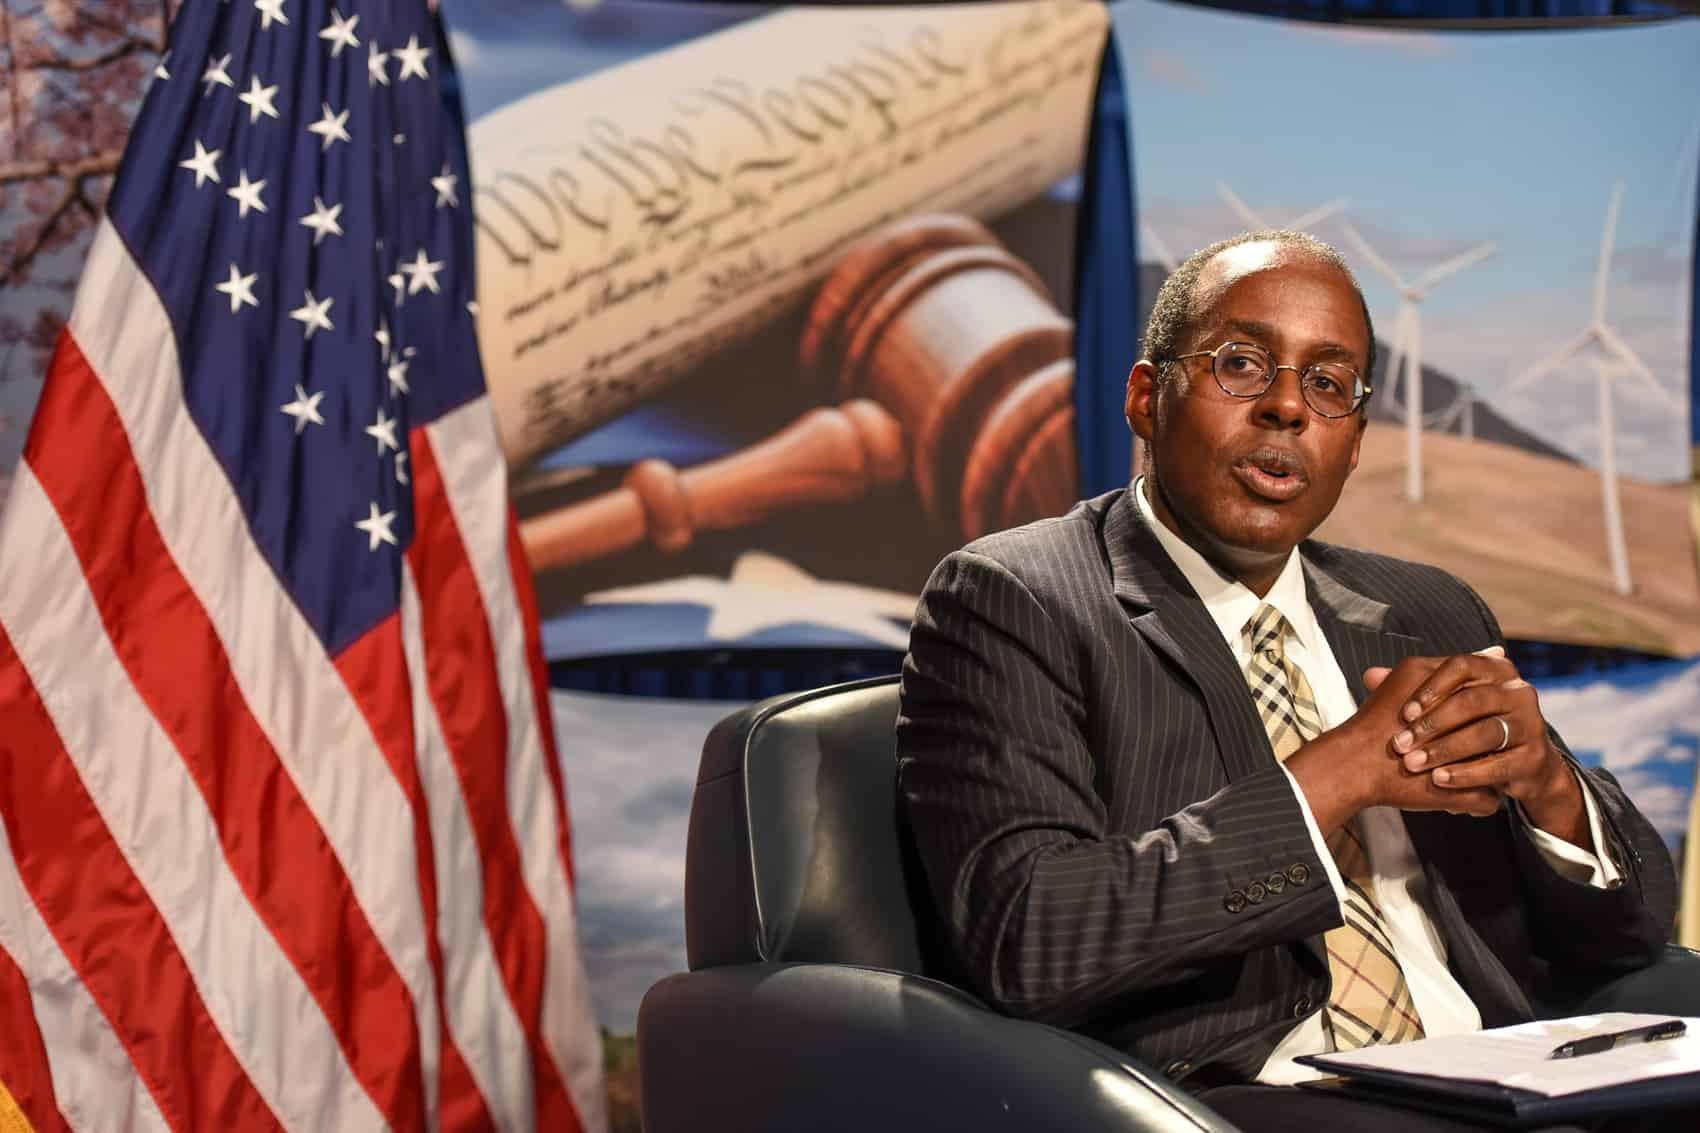 U.S. Ambassador to Costa Rica S. Fitzgerald Haney.